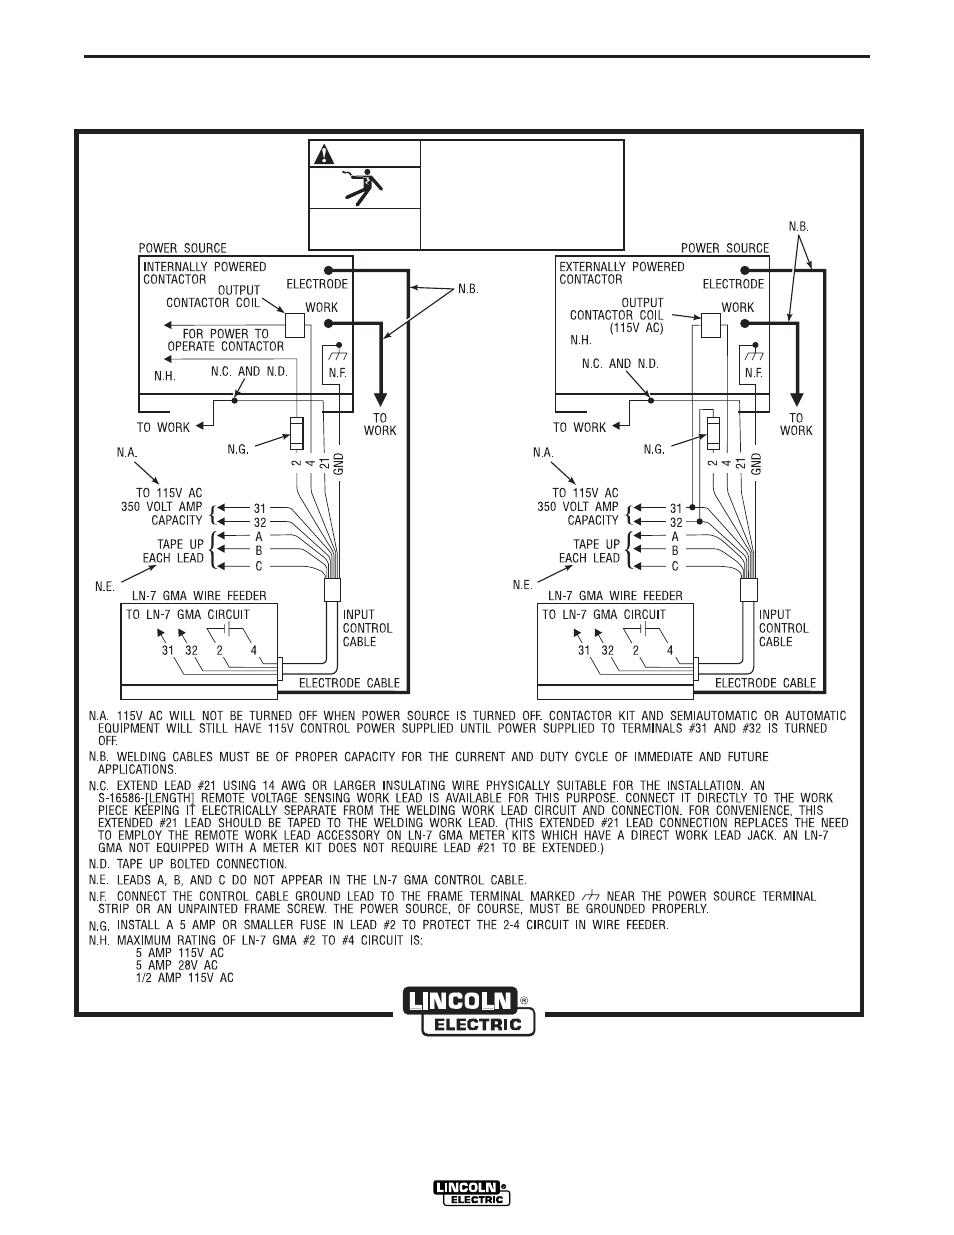 Lincoln Ln7 Wire Feeder Diagram Auto Electrical Wiring Geist Caravan Parts U2022 For Free